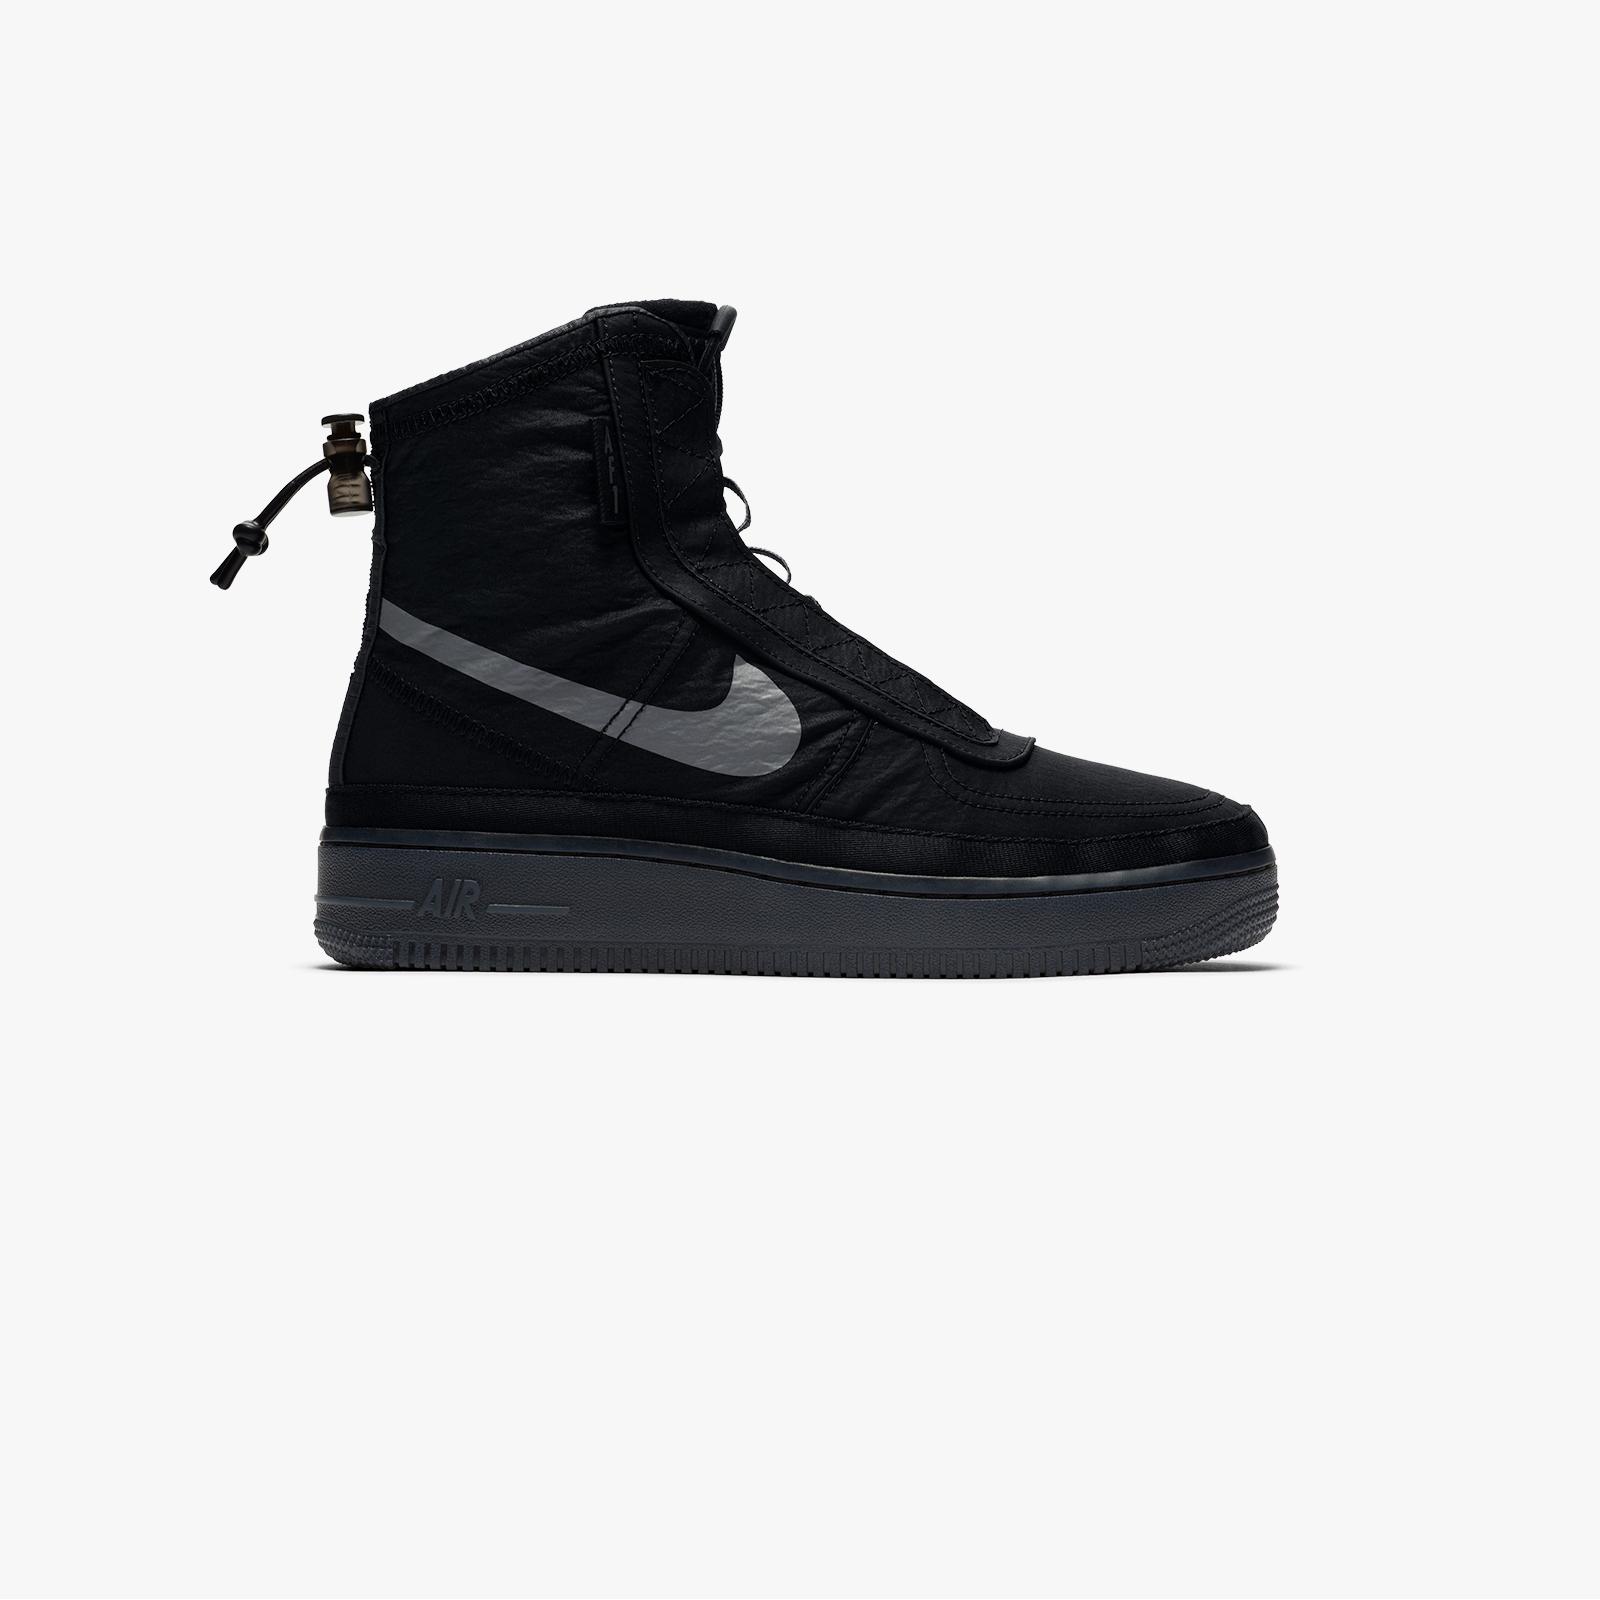 Nike Wmns AF1 Shell Bq6096 001 Sneakersnstuff   sneakers